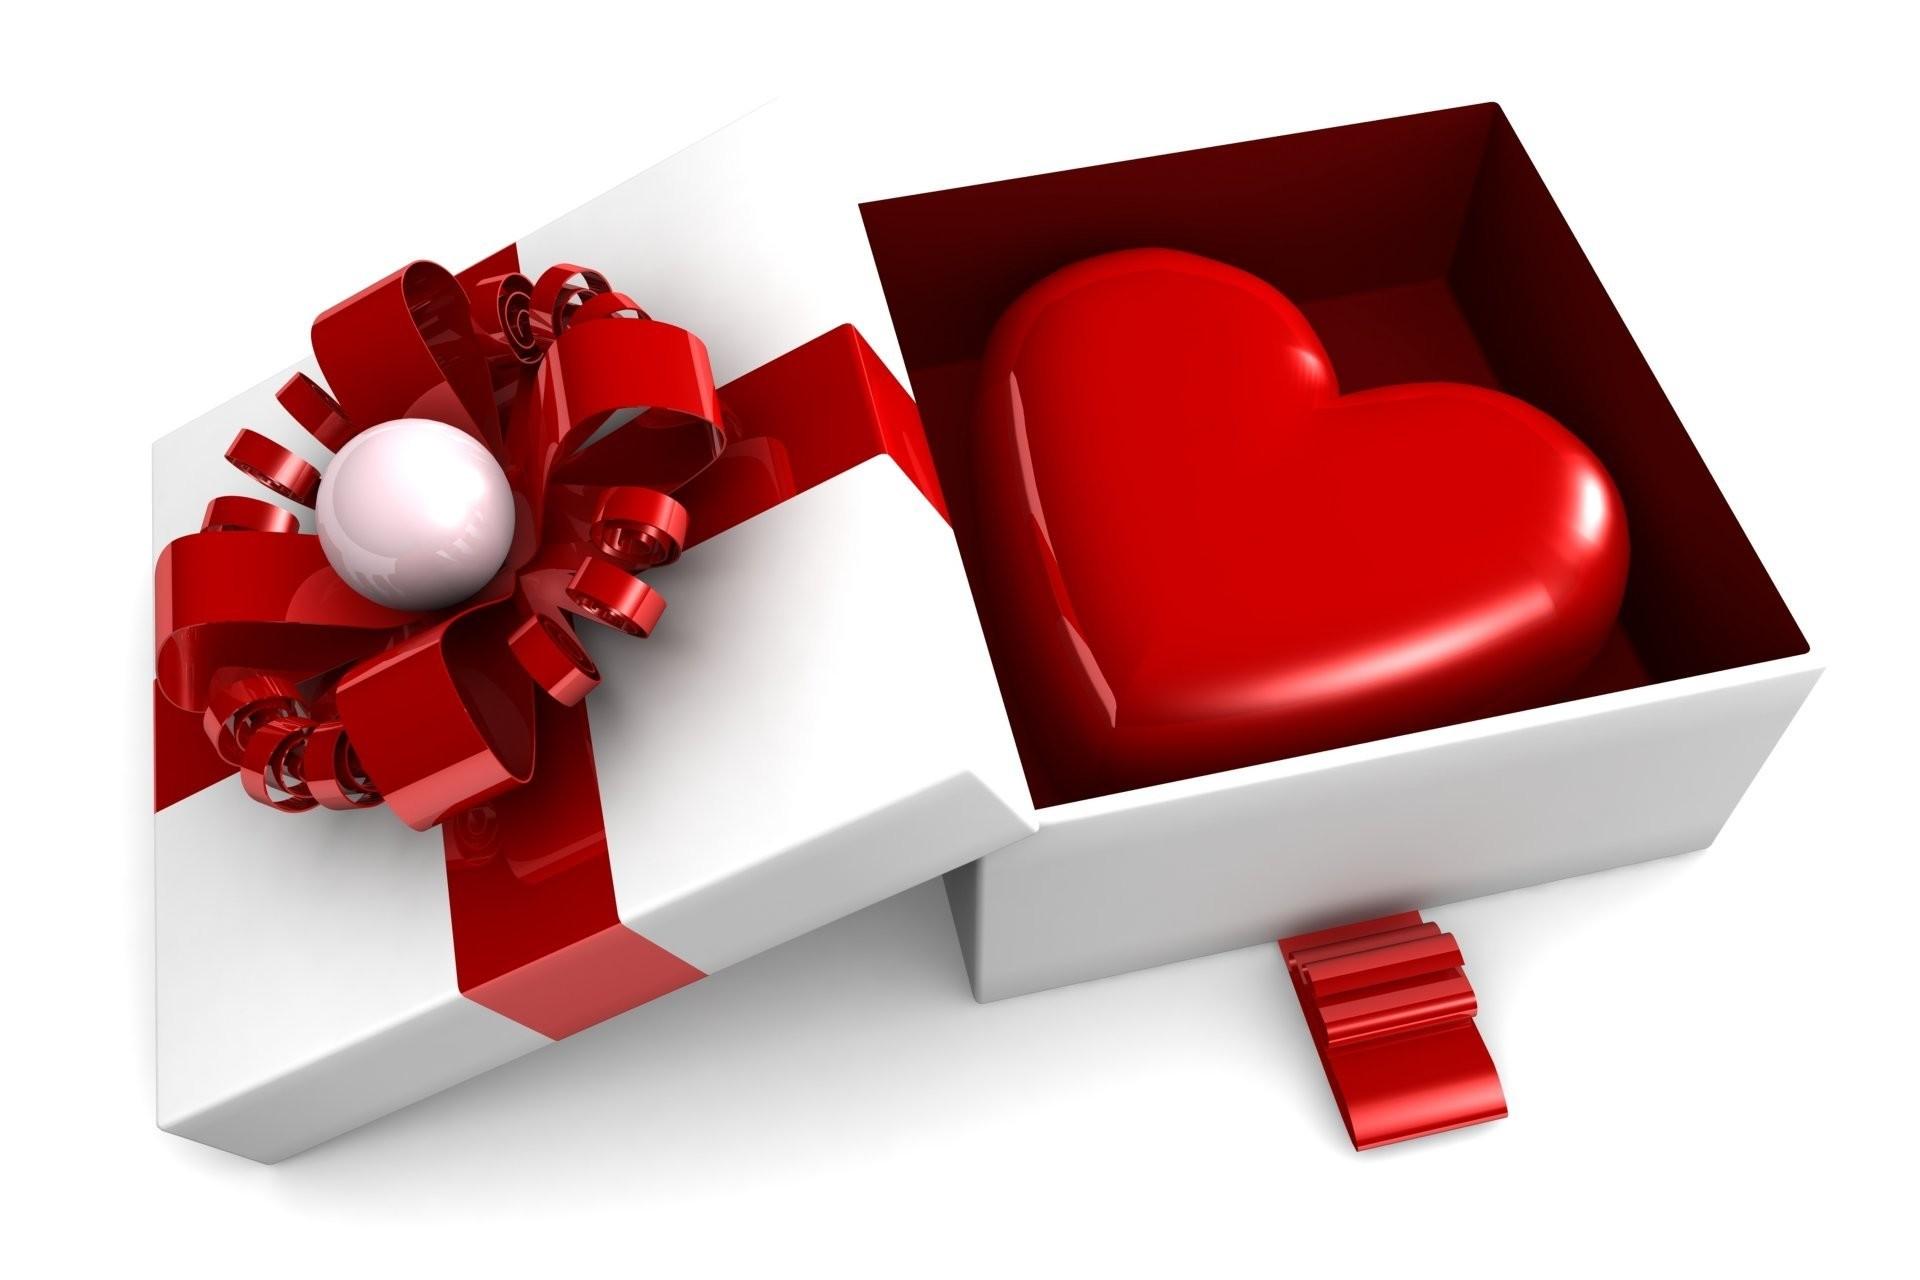 valentine's day romantic heart gift love box heart present